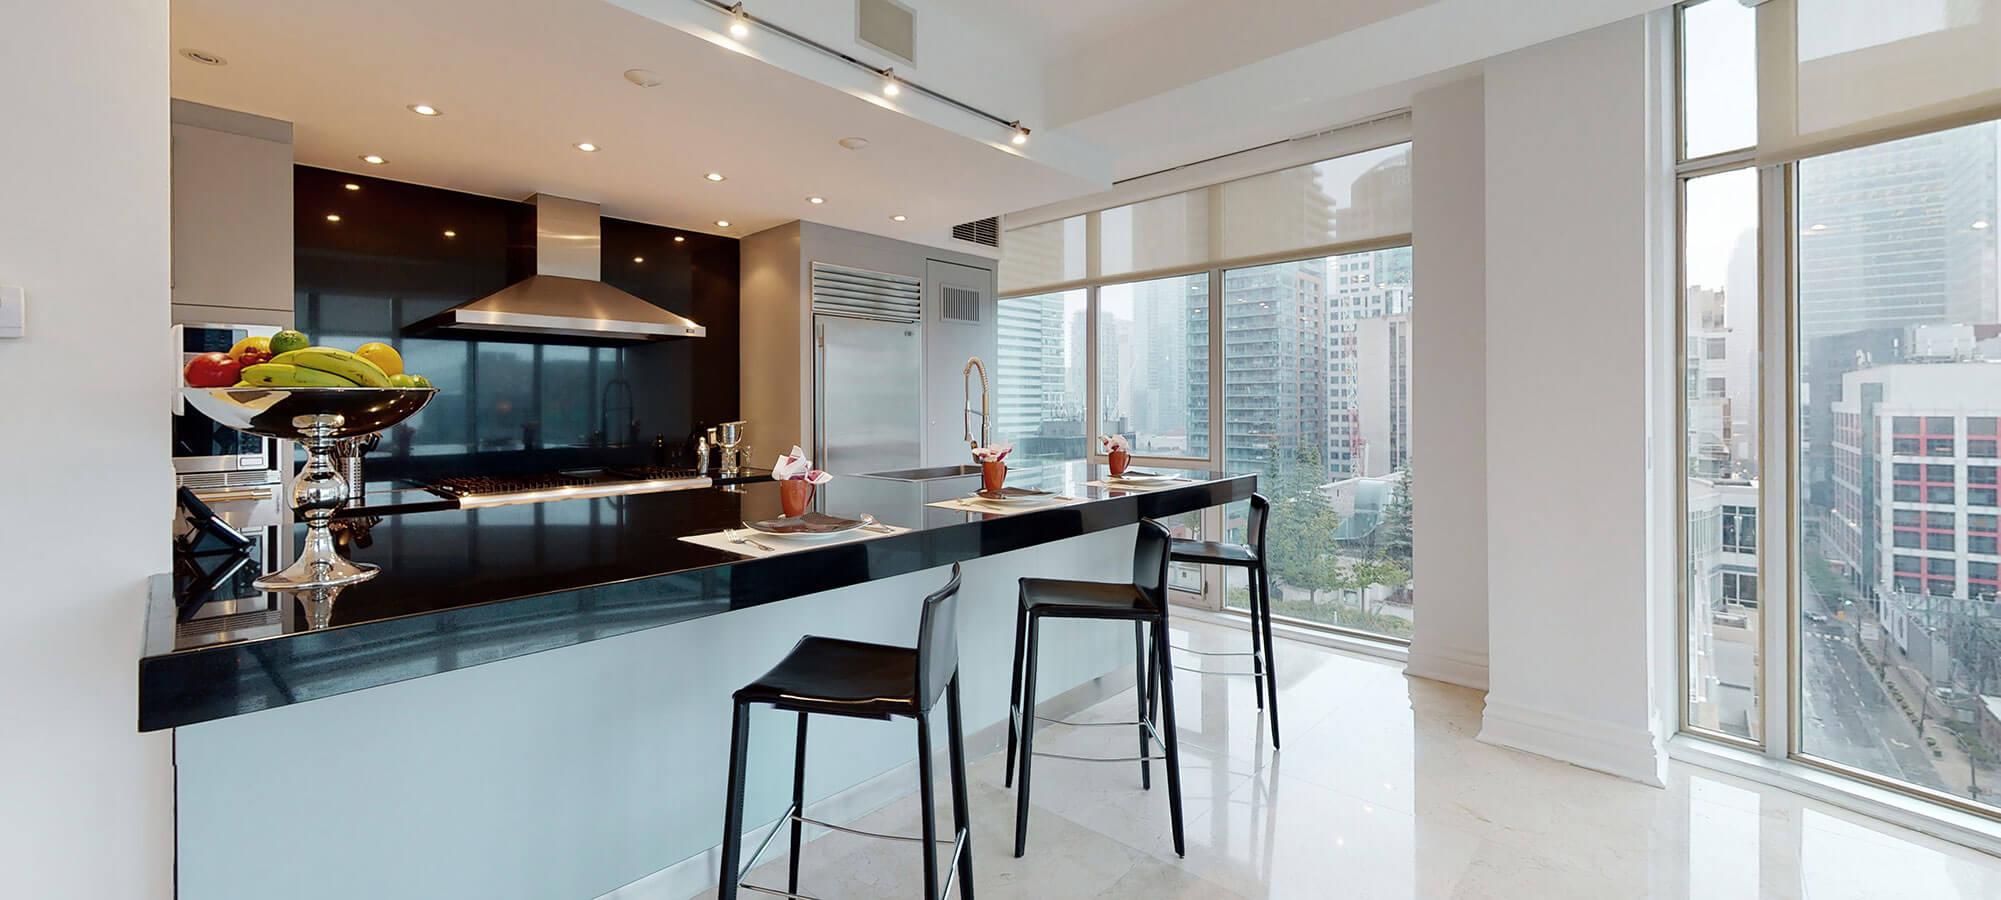 Kitchen and Bar at The SoHo Hotel 3-storey Penthouse